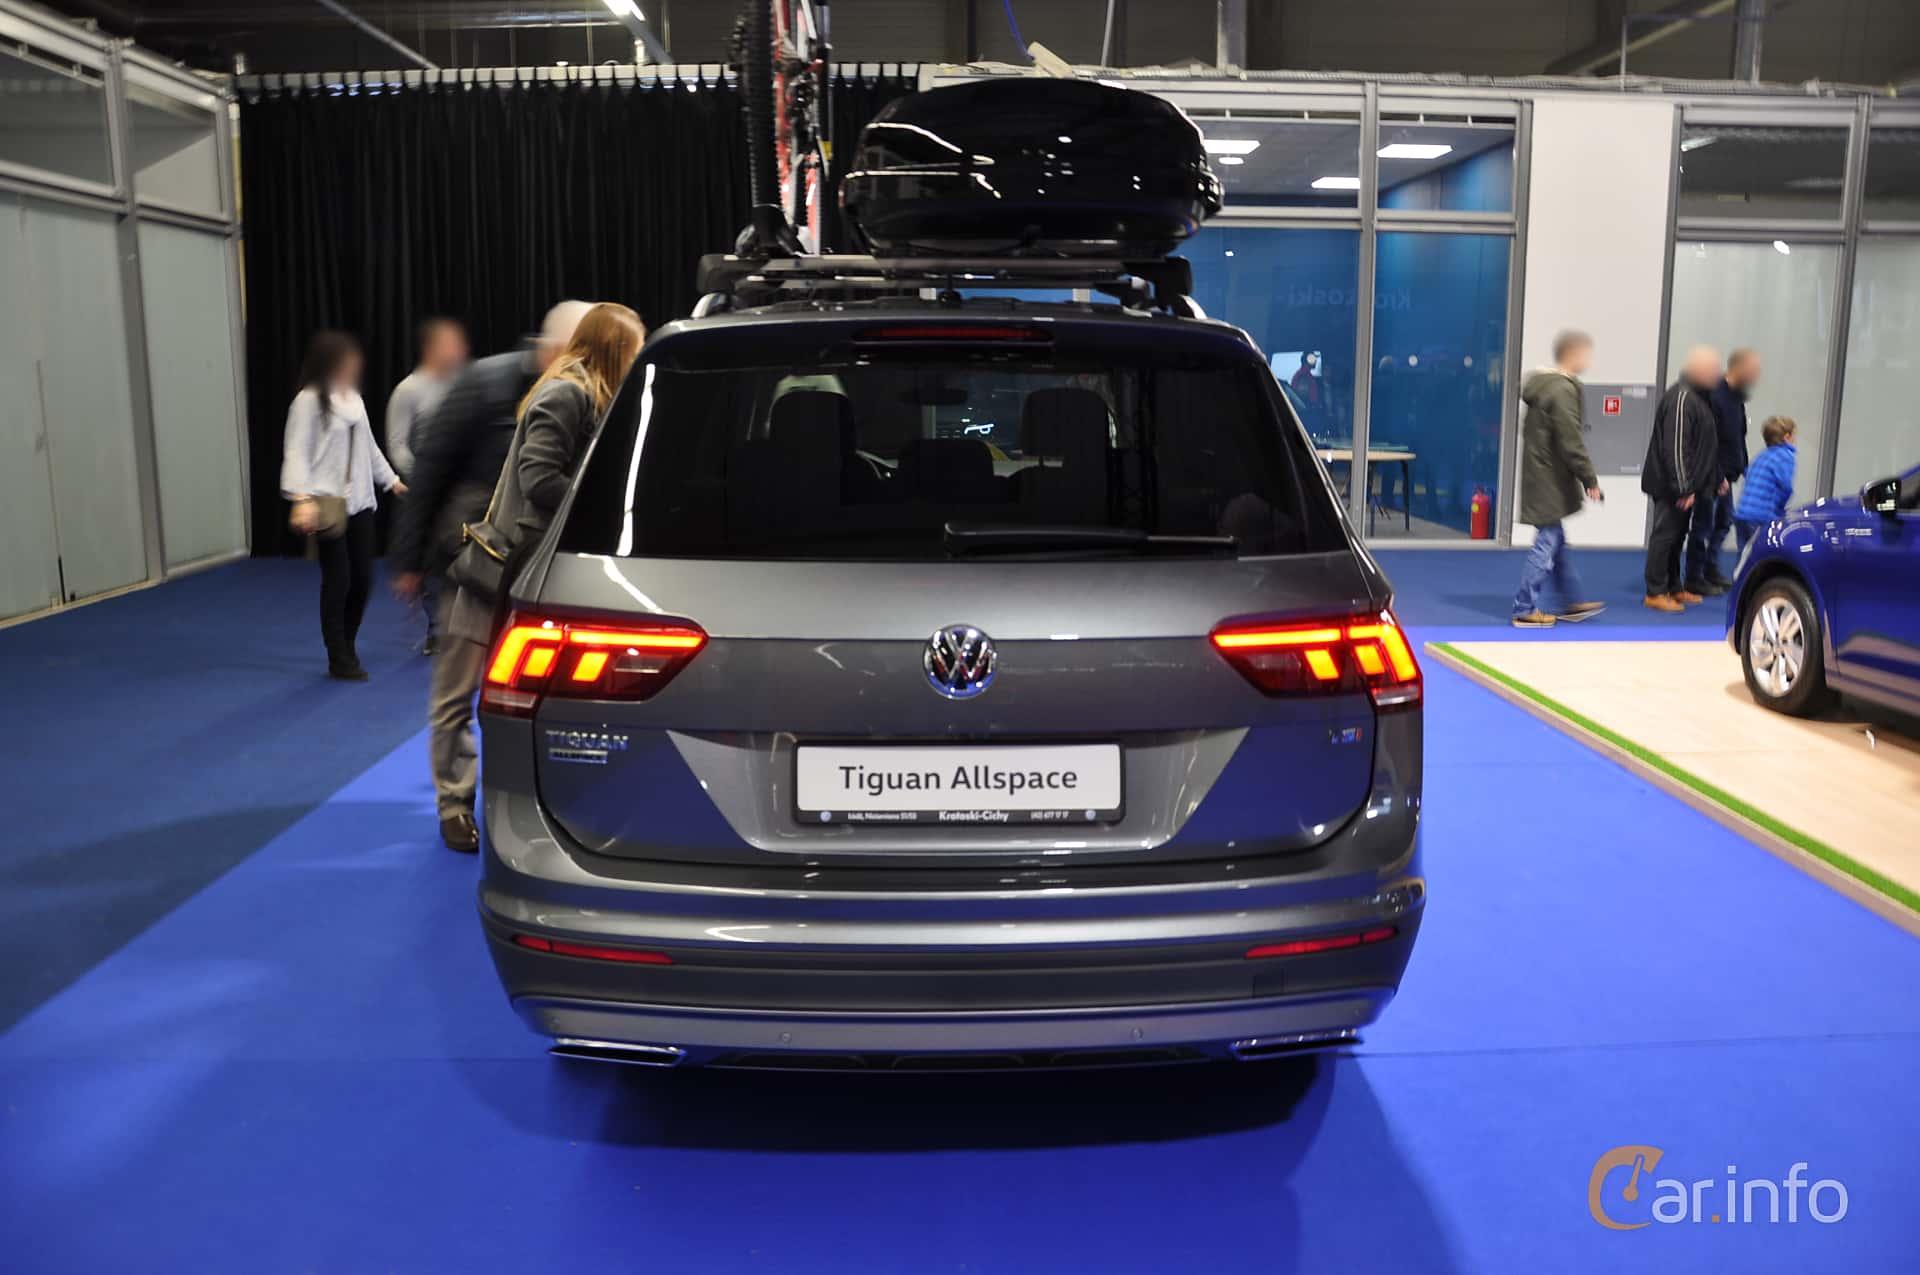 Volkswagen Tiguan Allspace 2018 at Warsawa Motorshow 2018